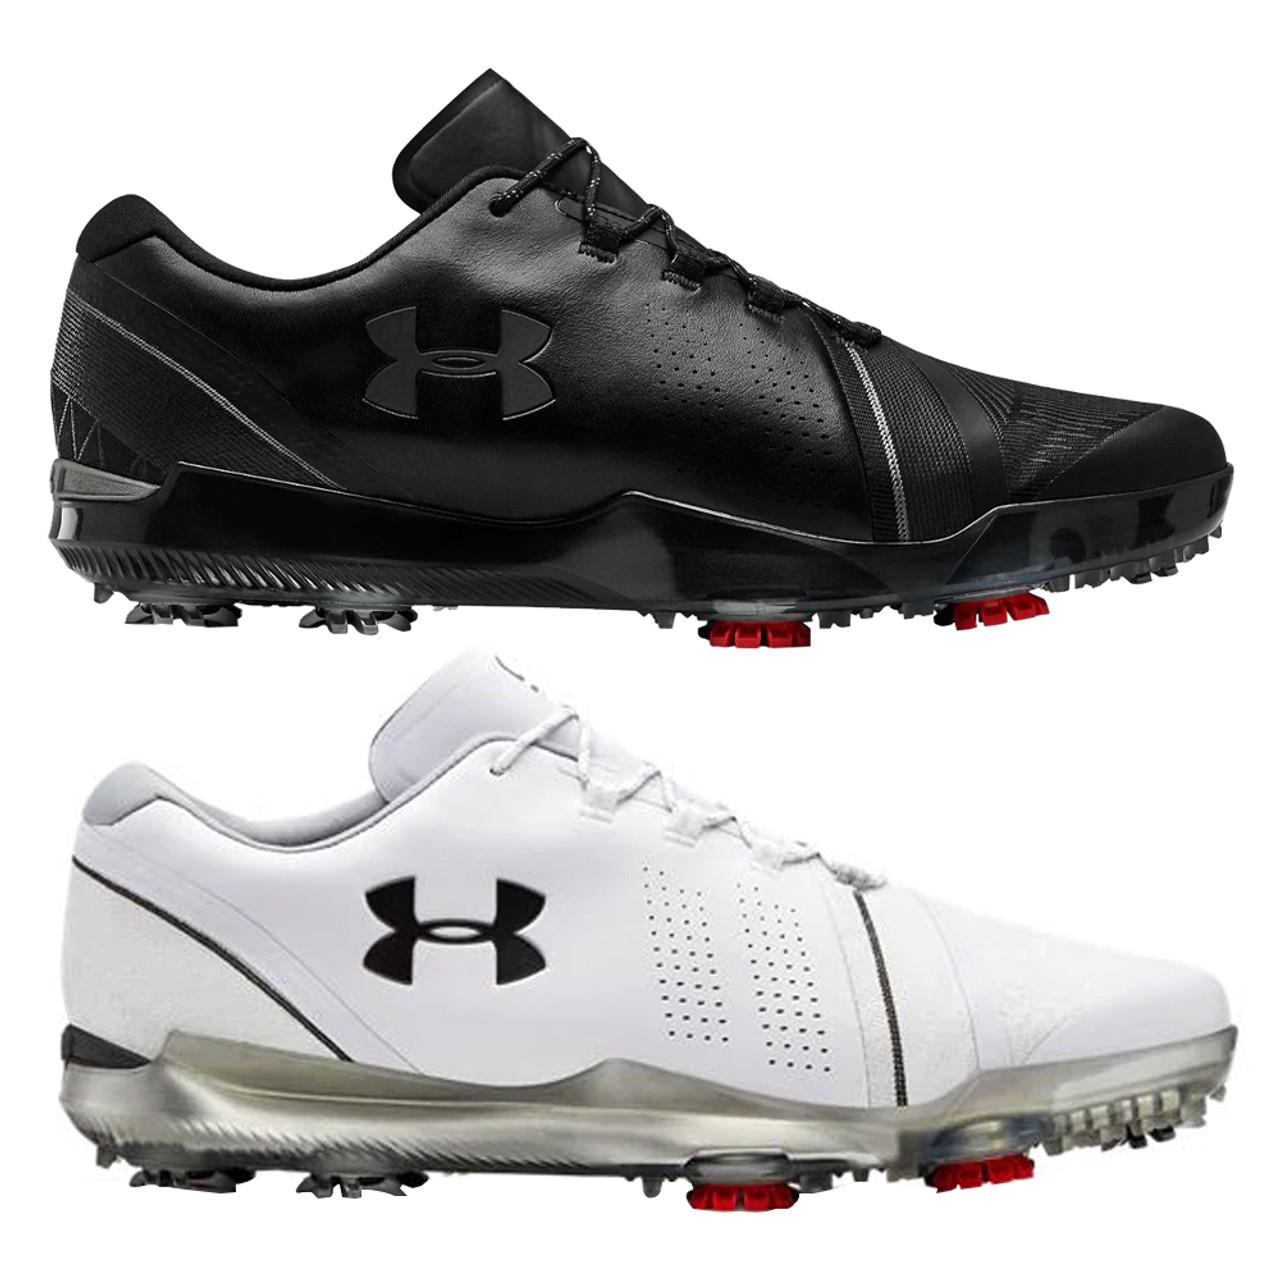 Under Armour Spieth 3 Golf Shoes 2019